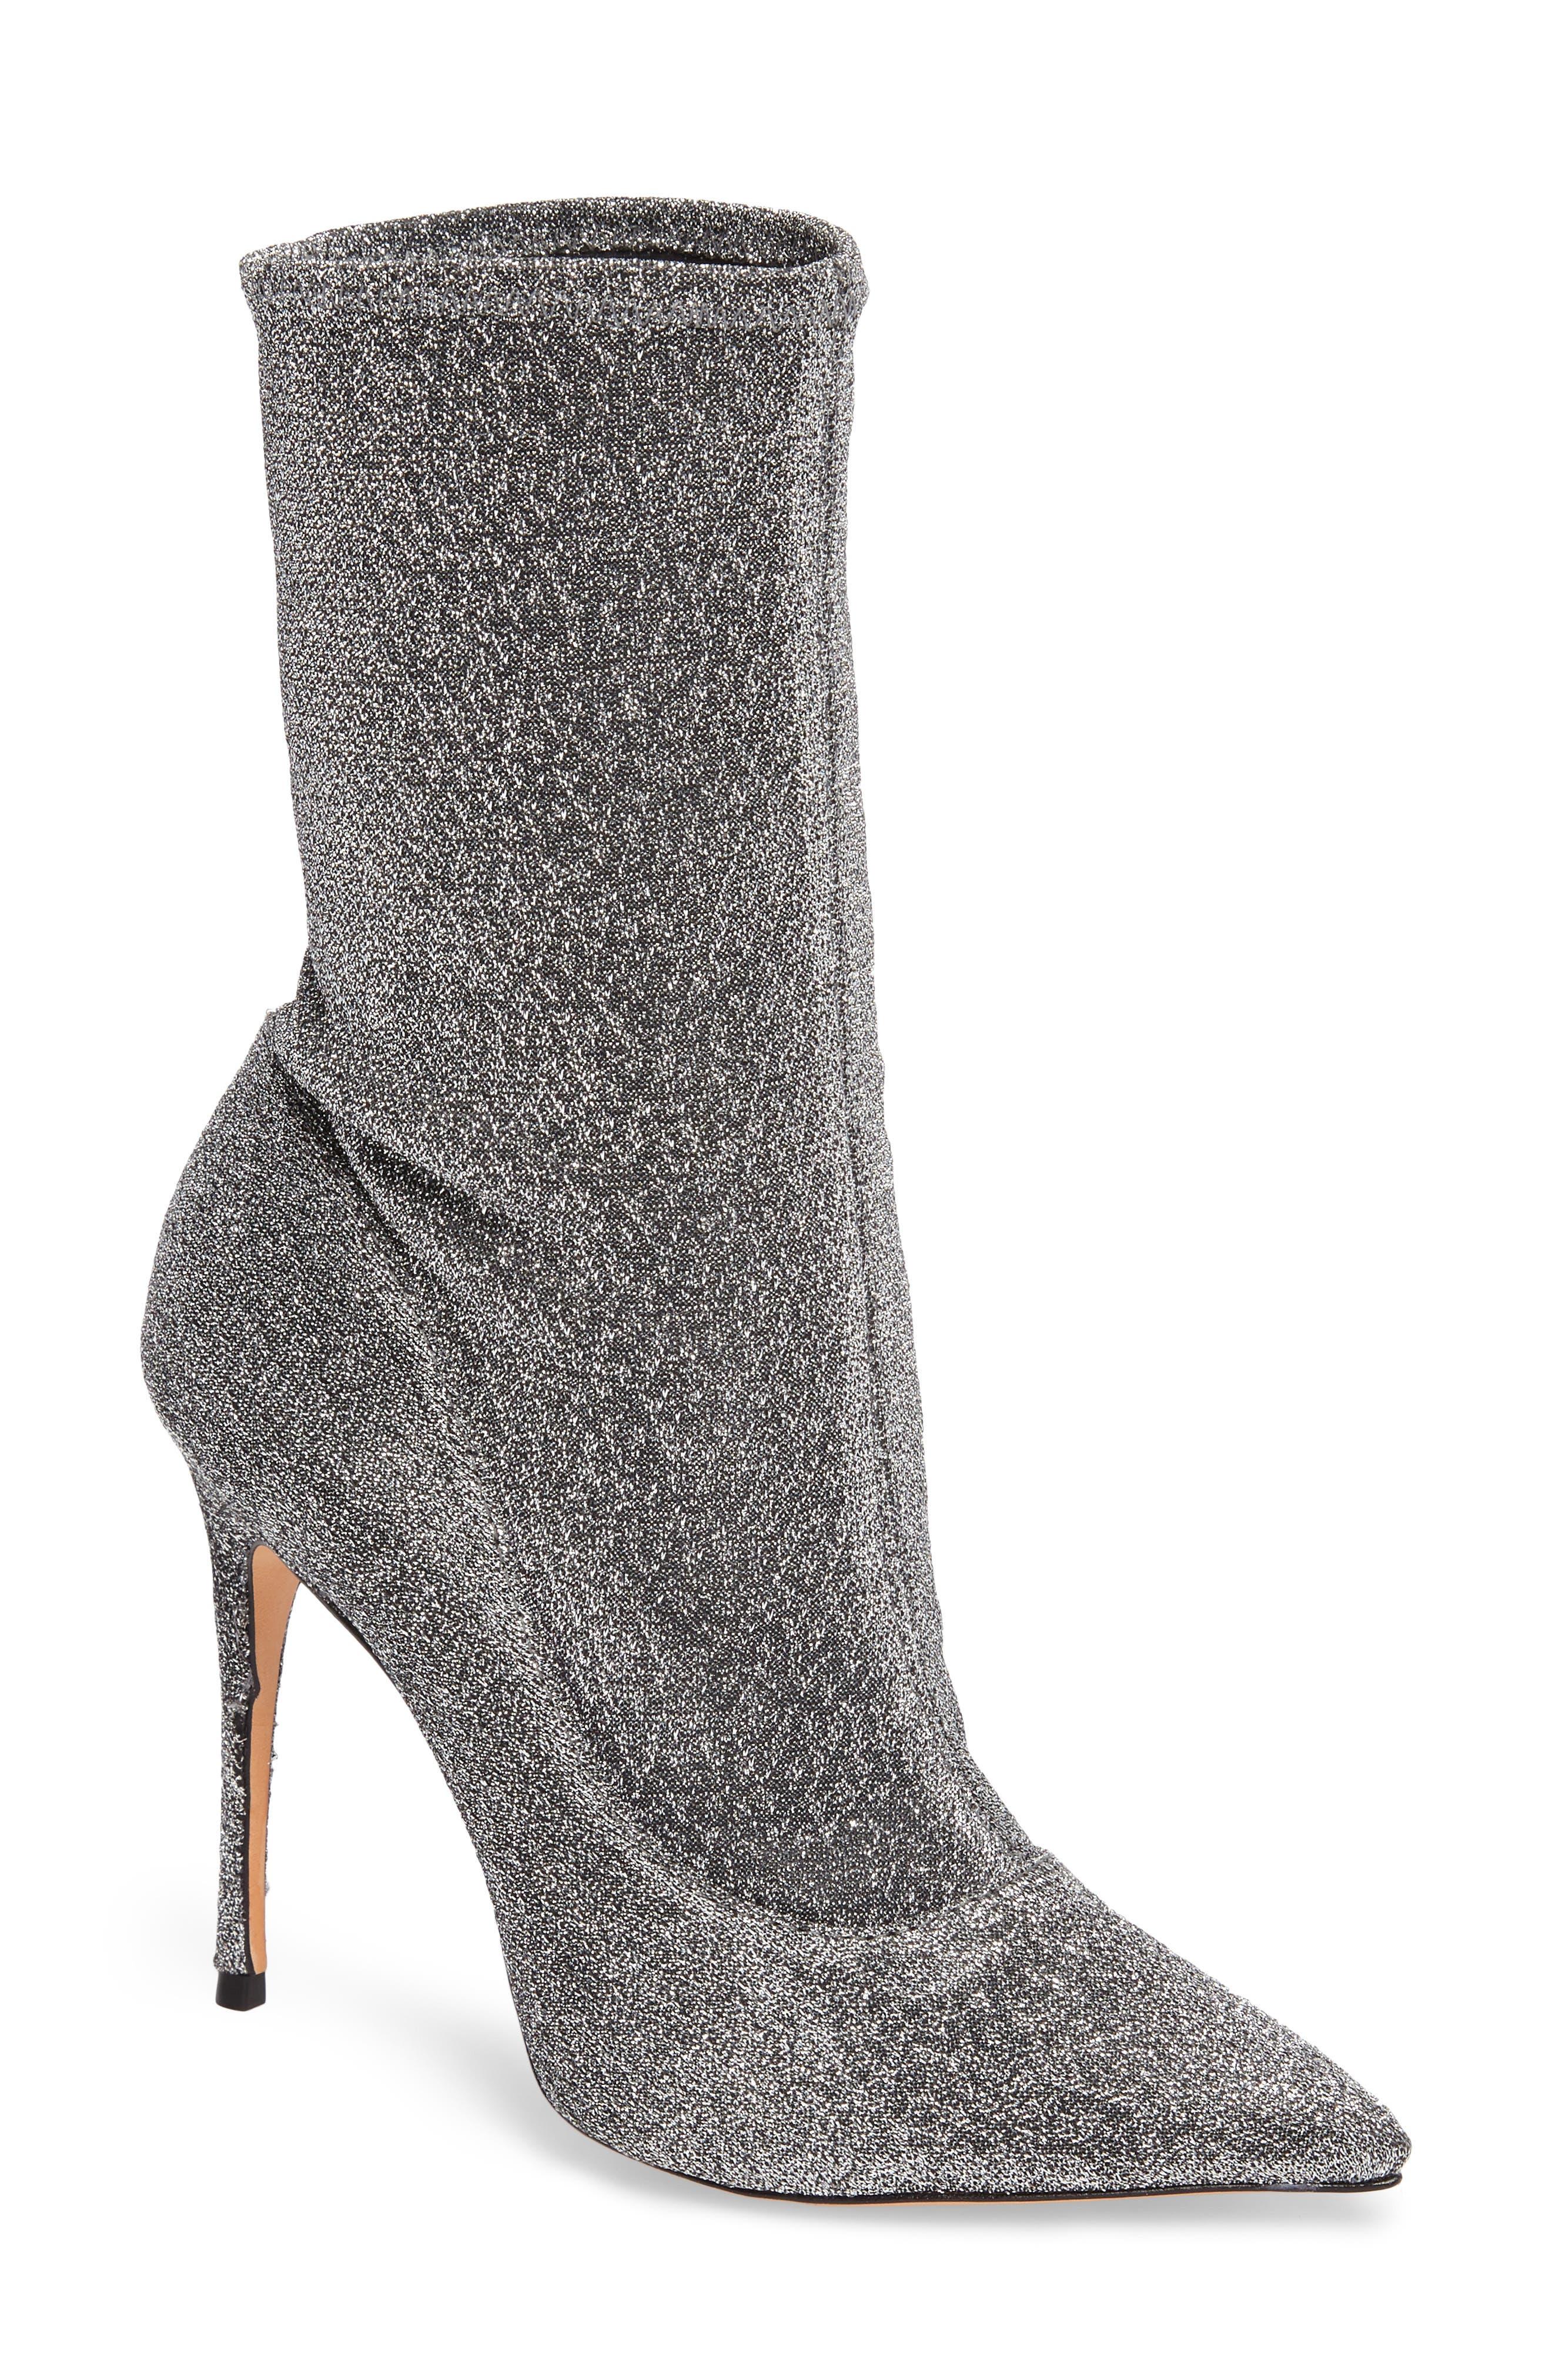 Mislane Pointy Toe Sock Bootie,                         Main,                         color, 020